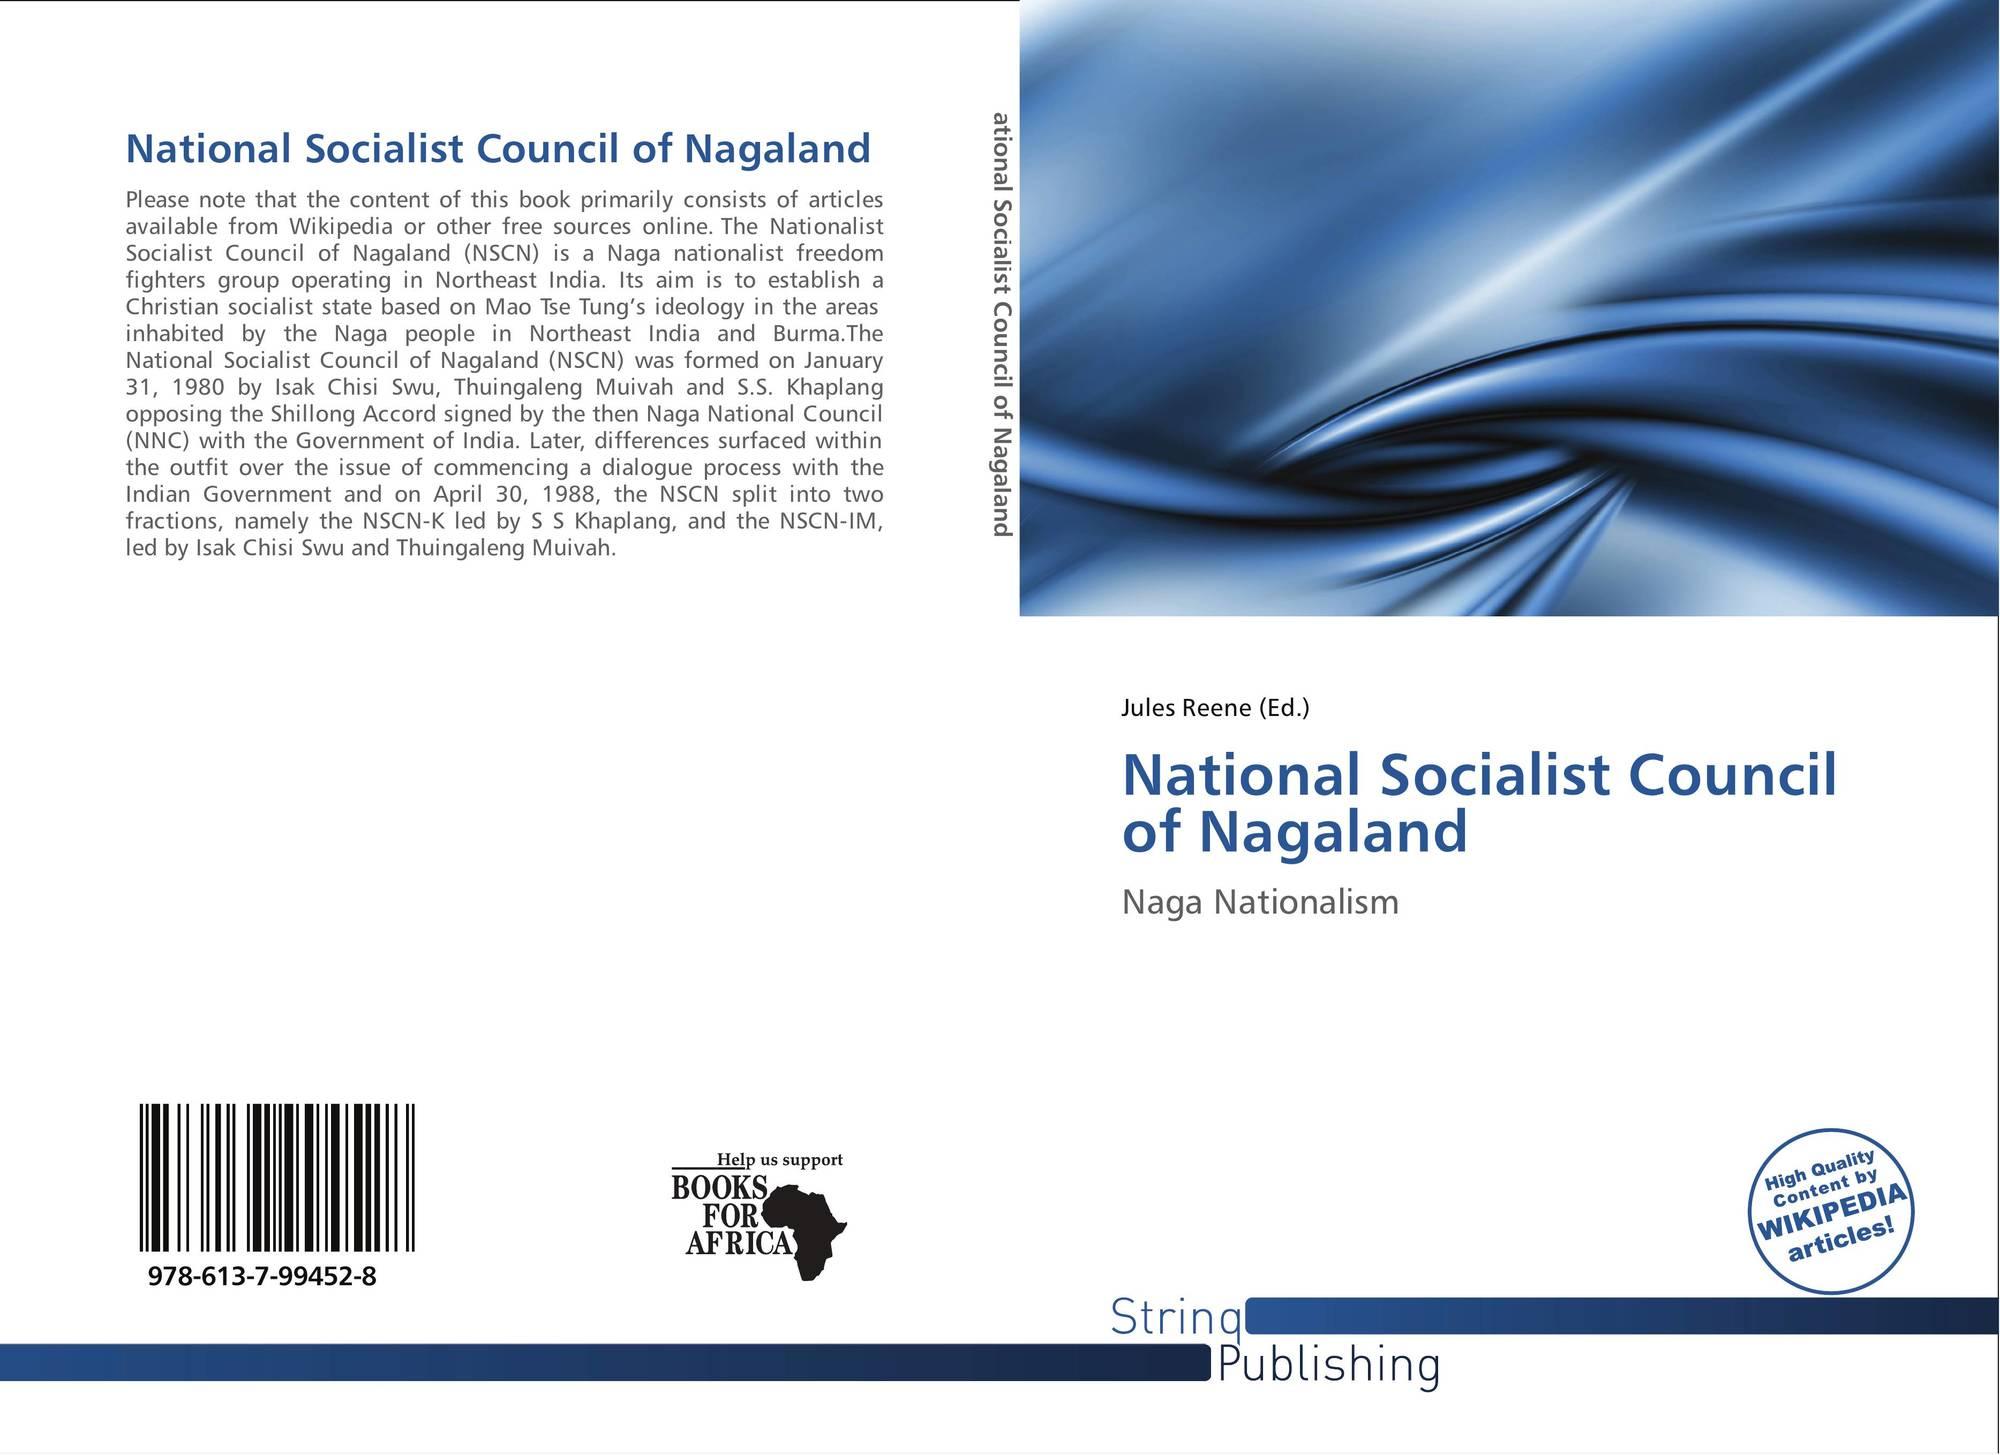 National Socialist Council of Nagaland, 978-613-7-99452-8